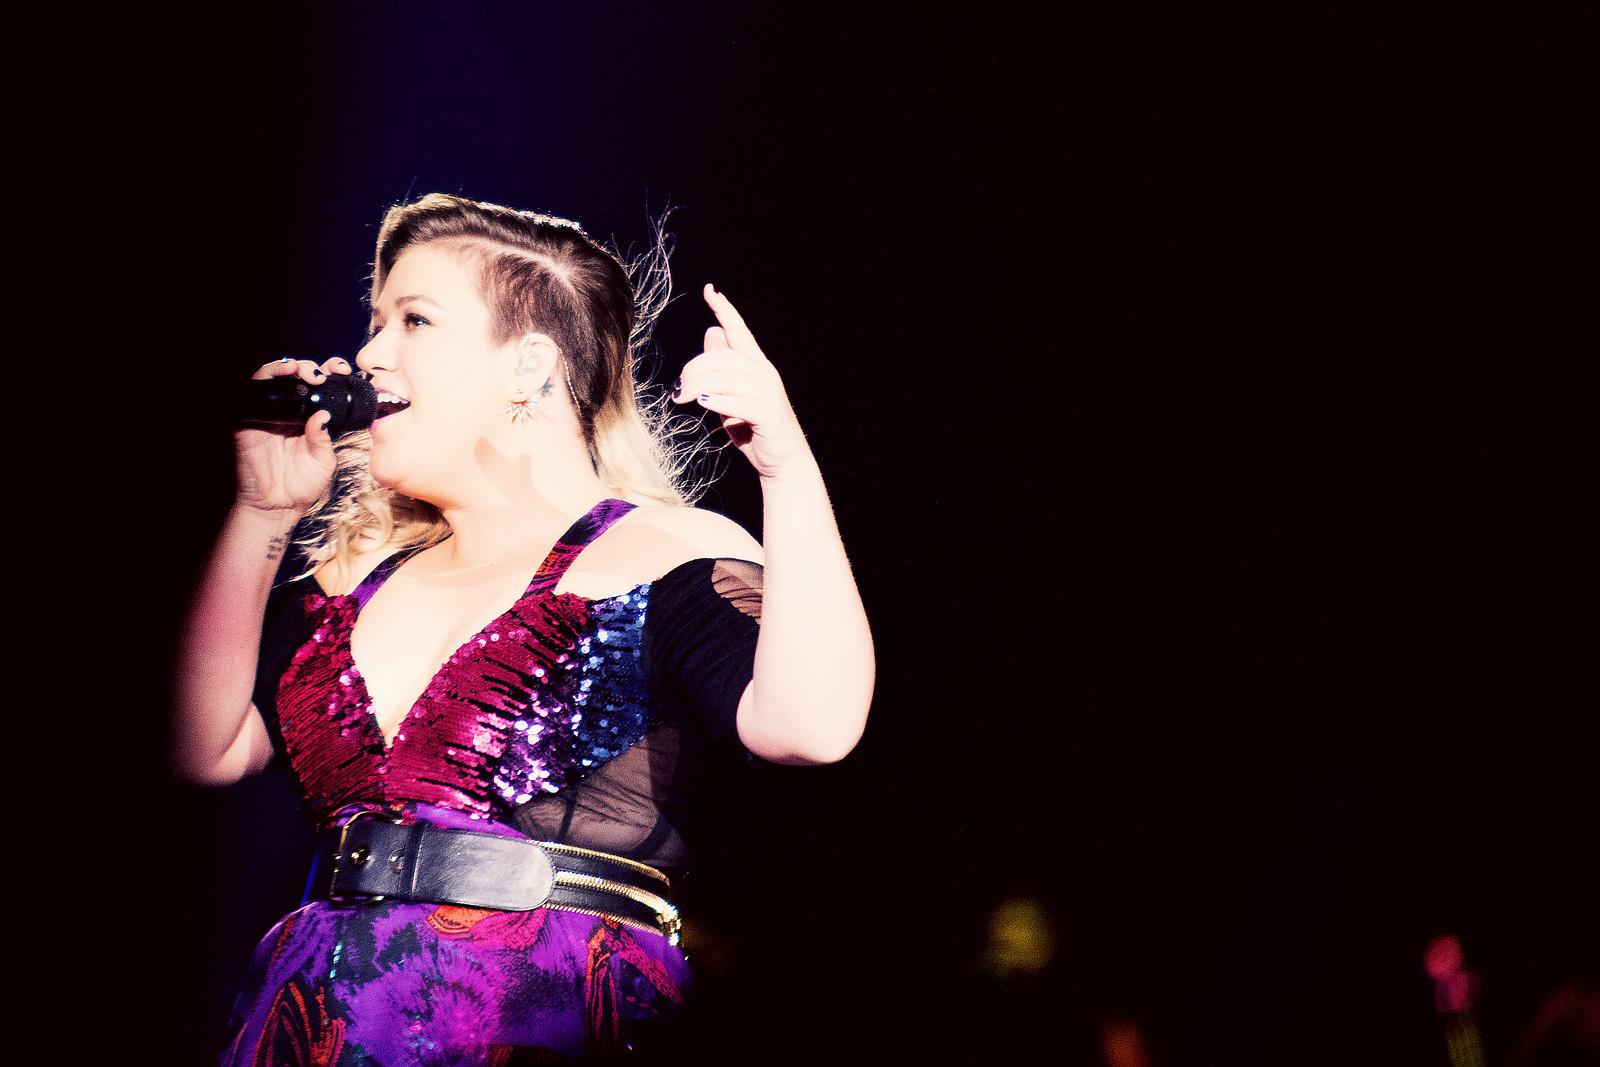 Kelly Clarkson - Denver concert 2015